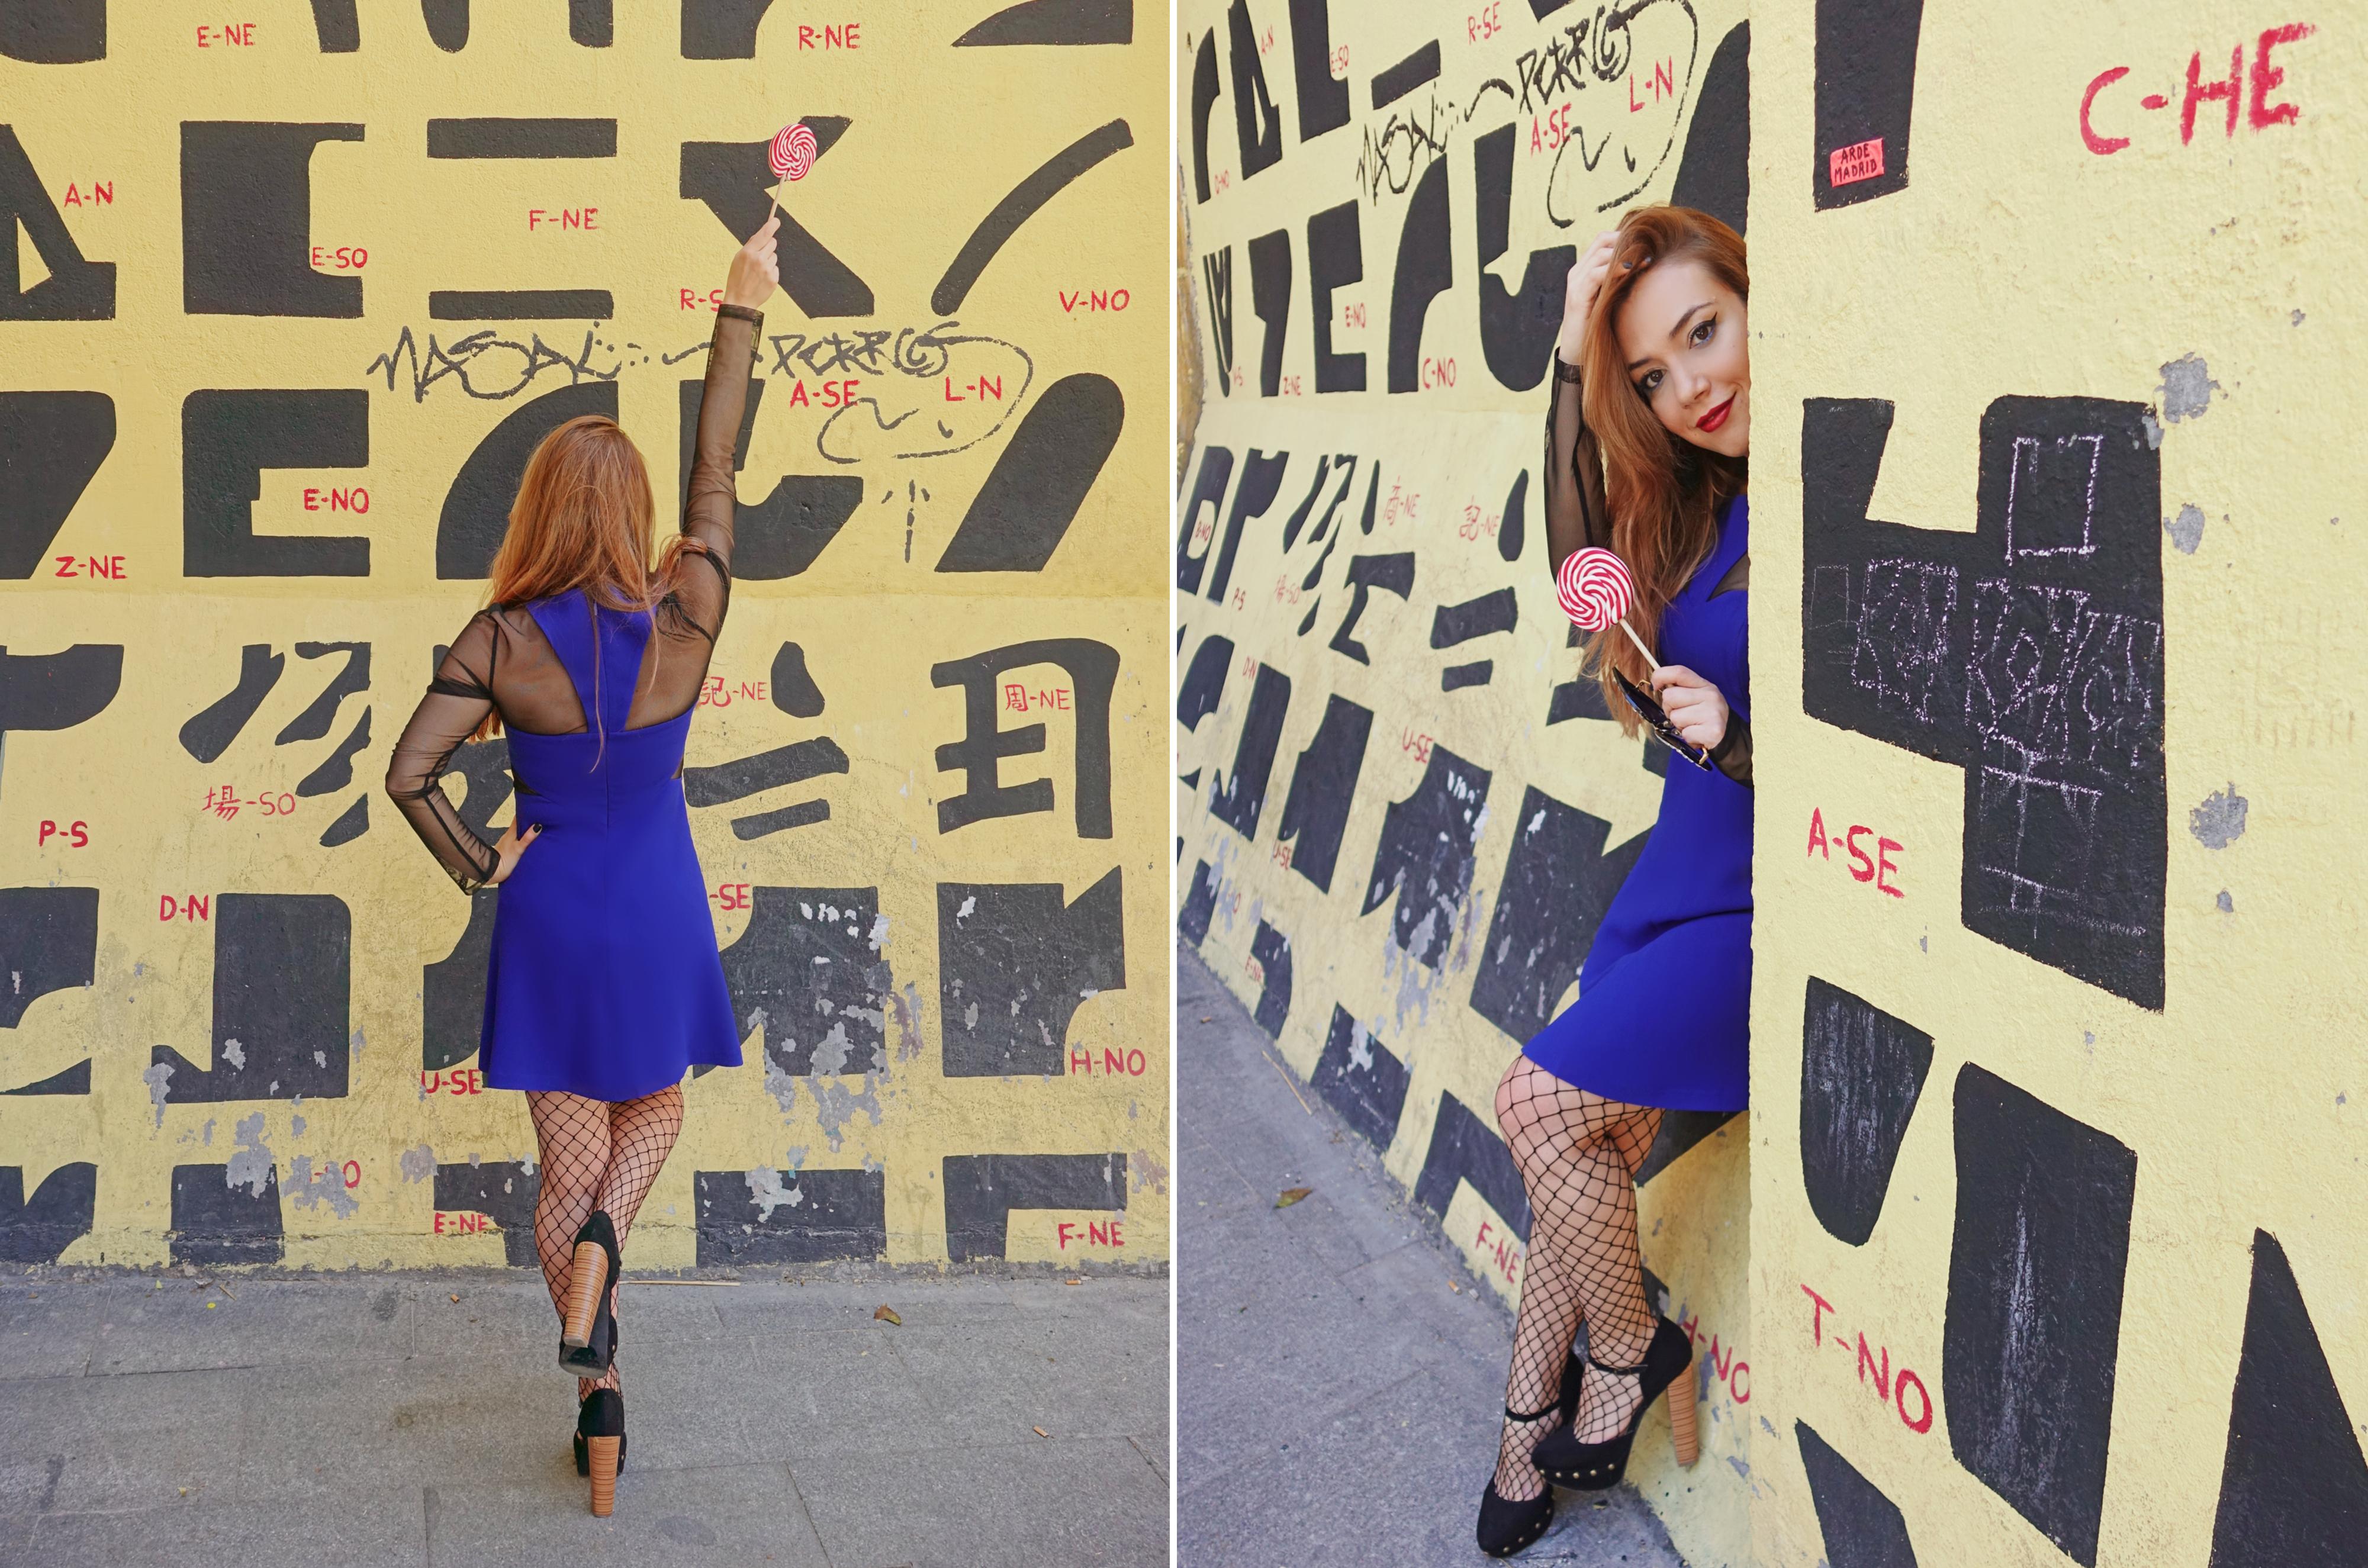 Blog-de-moda-ChicAdicta-fashionista-PiensaenChic-influencer-vestidos-bcbg-showroomprive-Piensa-en-chic